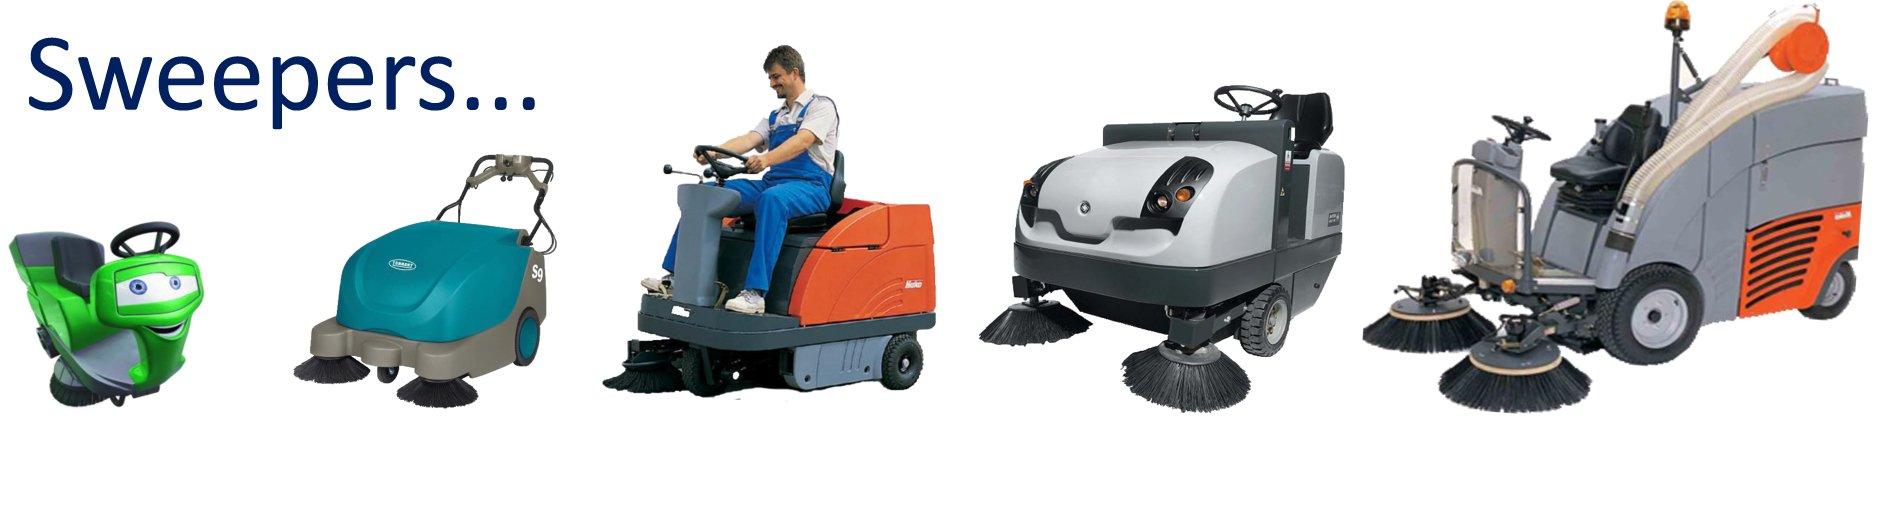 Sweepers-Slider-v3